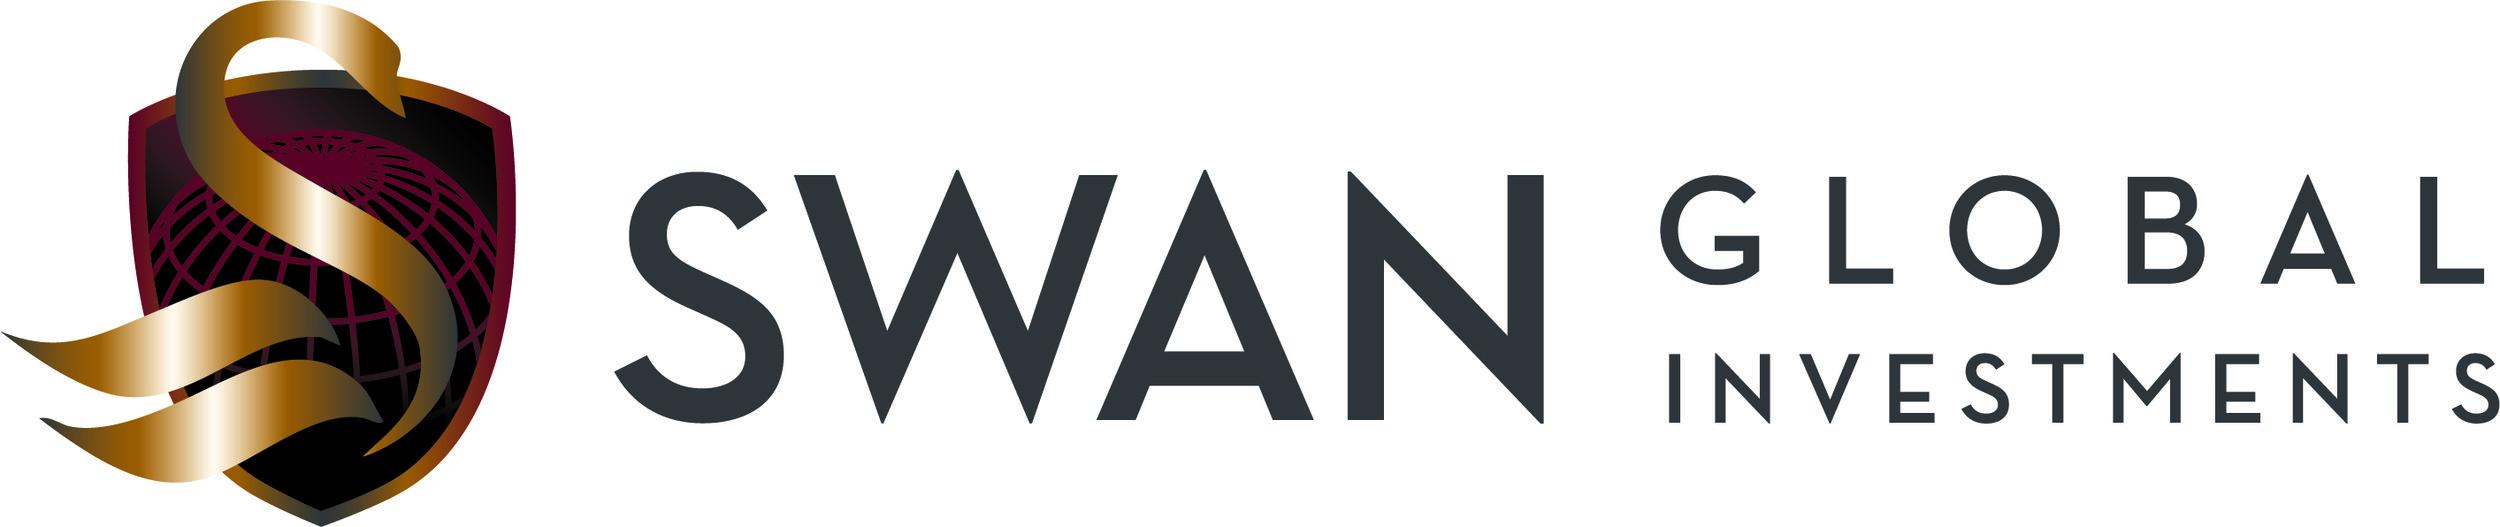 SwanGlobal_logo_standard.jpg